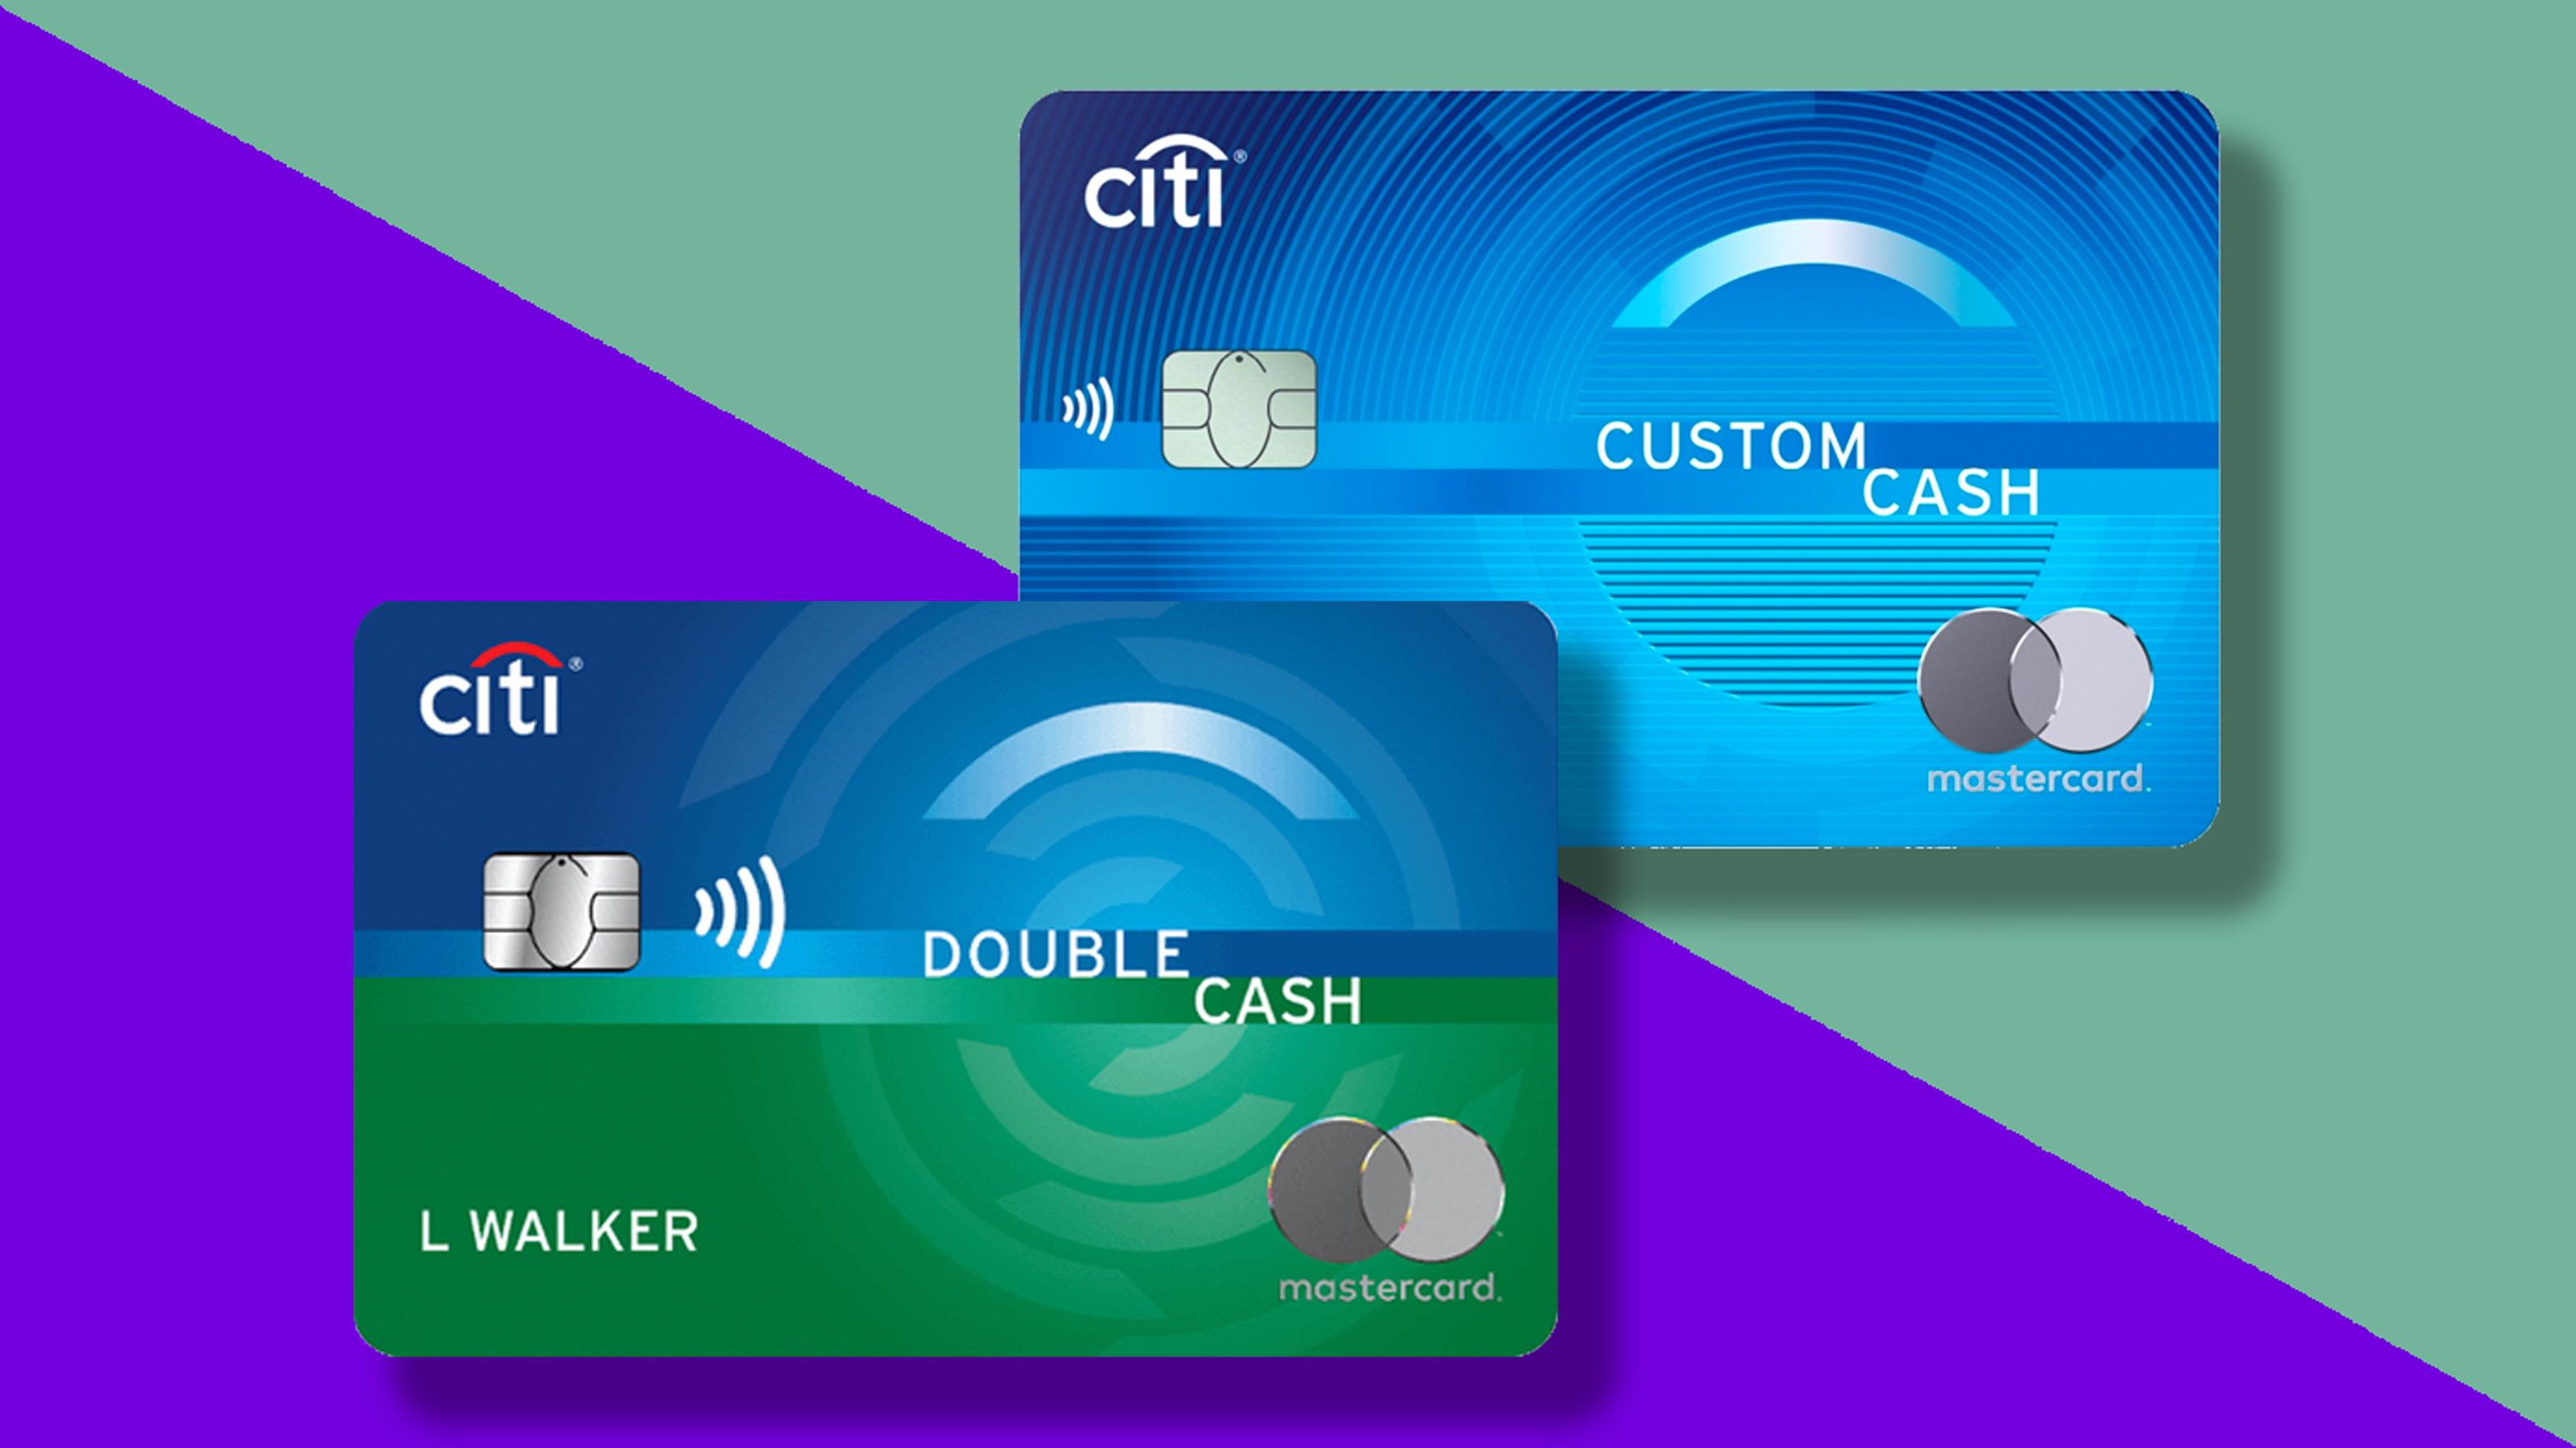 Citi Double Cash vs. Citi Custom Cash credit card CNN Underscored